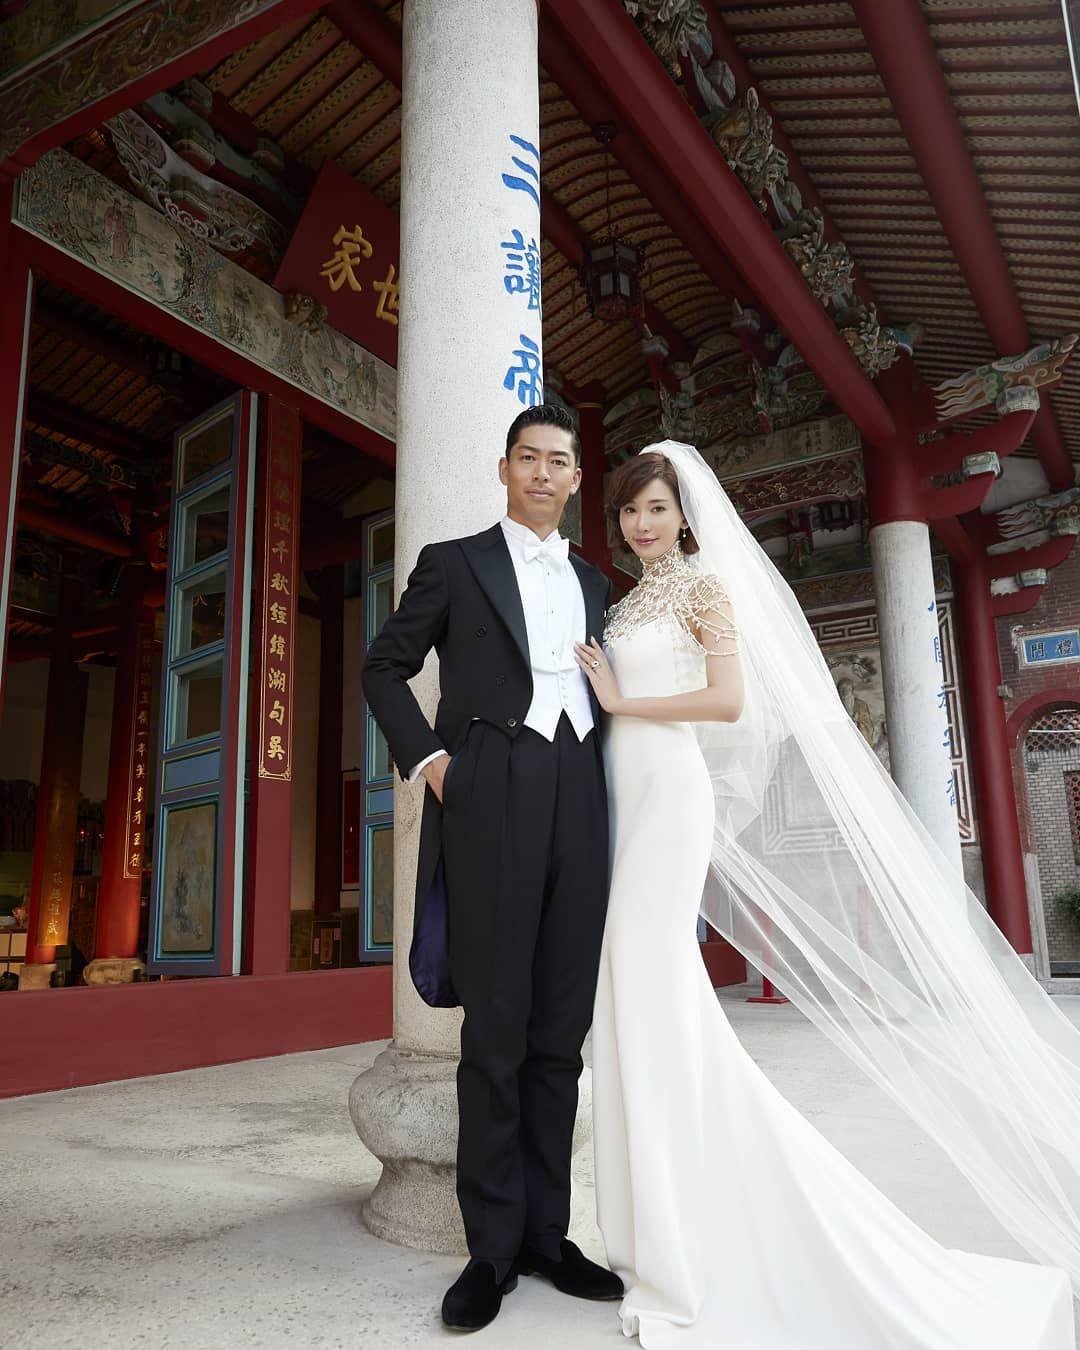 115 3k 個讚 3 739 則留言 Instagram 上的 林志玲chiling Chiling Lin 1117 一起幸福 Wedding Wedding Dresses Happy Wedding